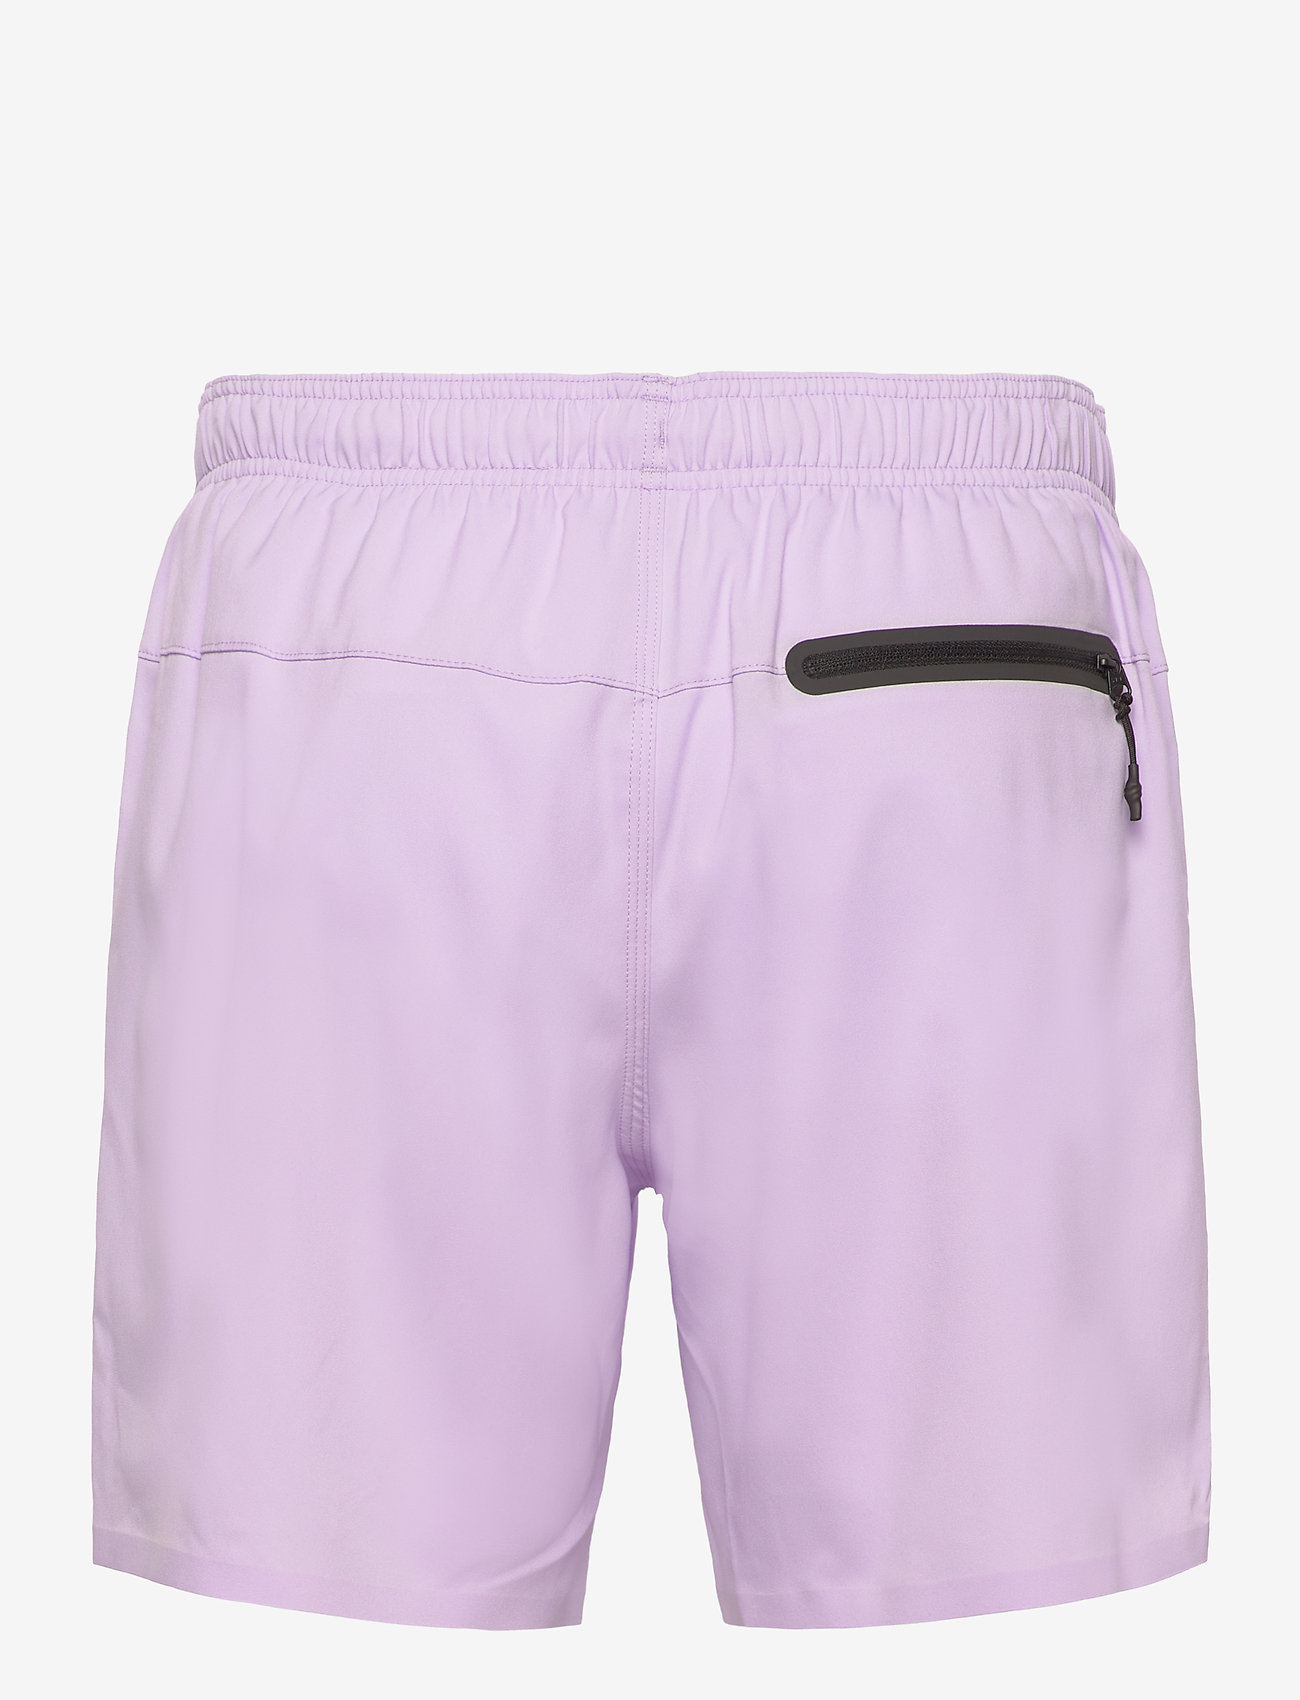 Puma Swim - PUMA SWIM MEN MEDIUM LENGTH SWIM SH - shorts - purple - 1